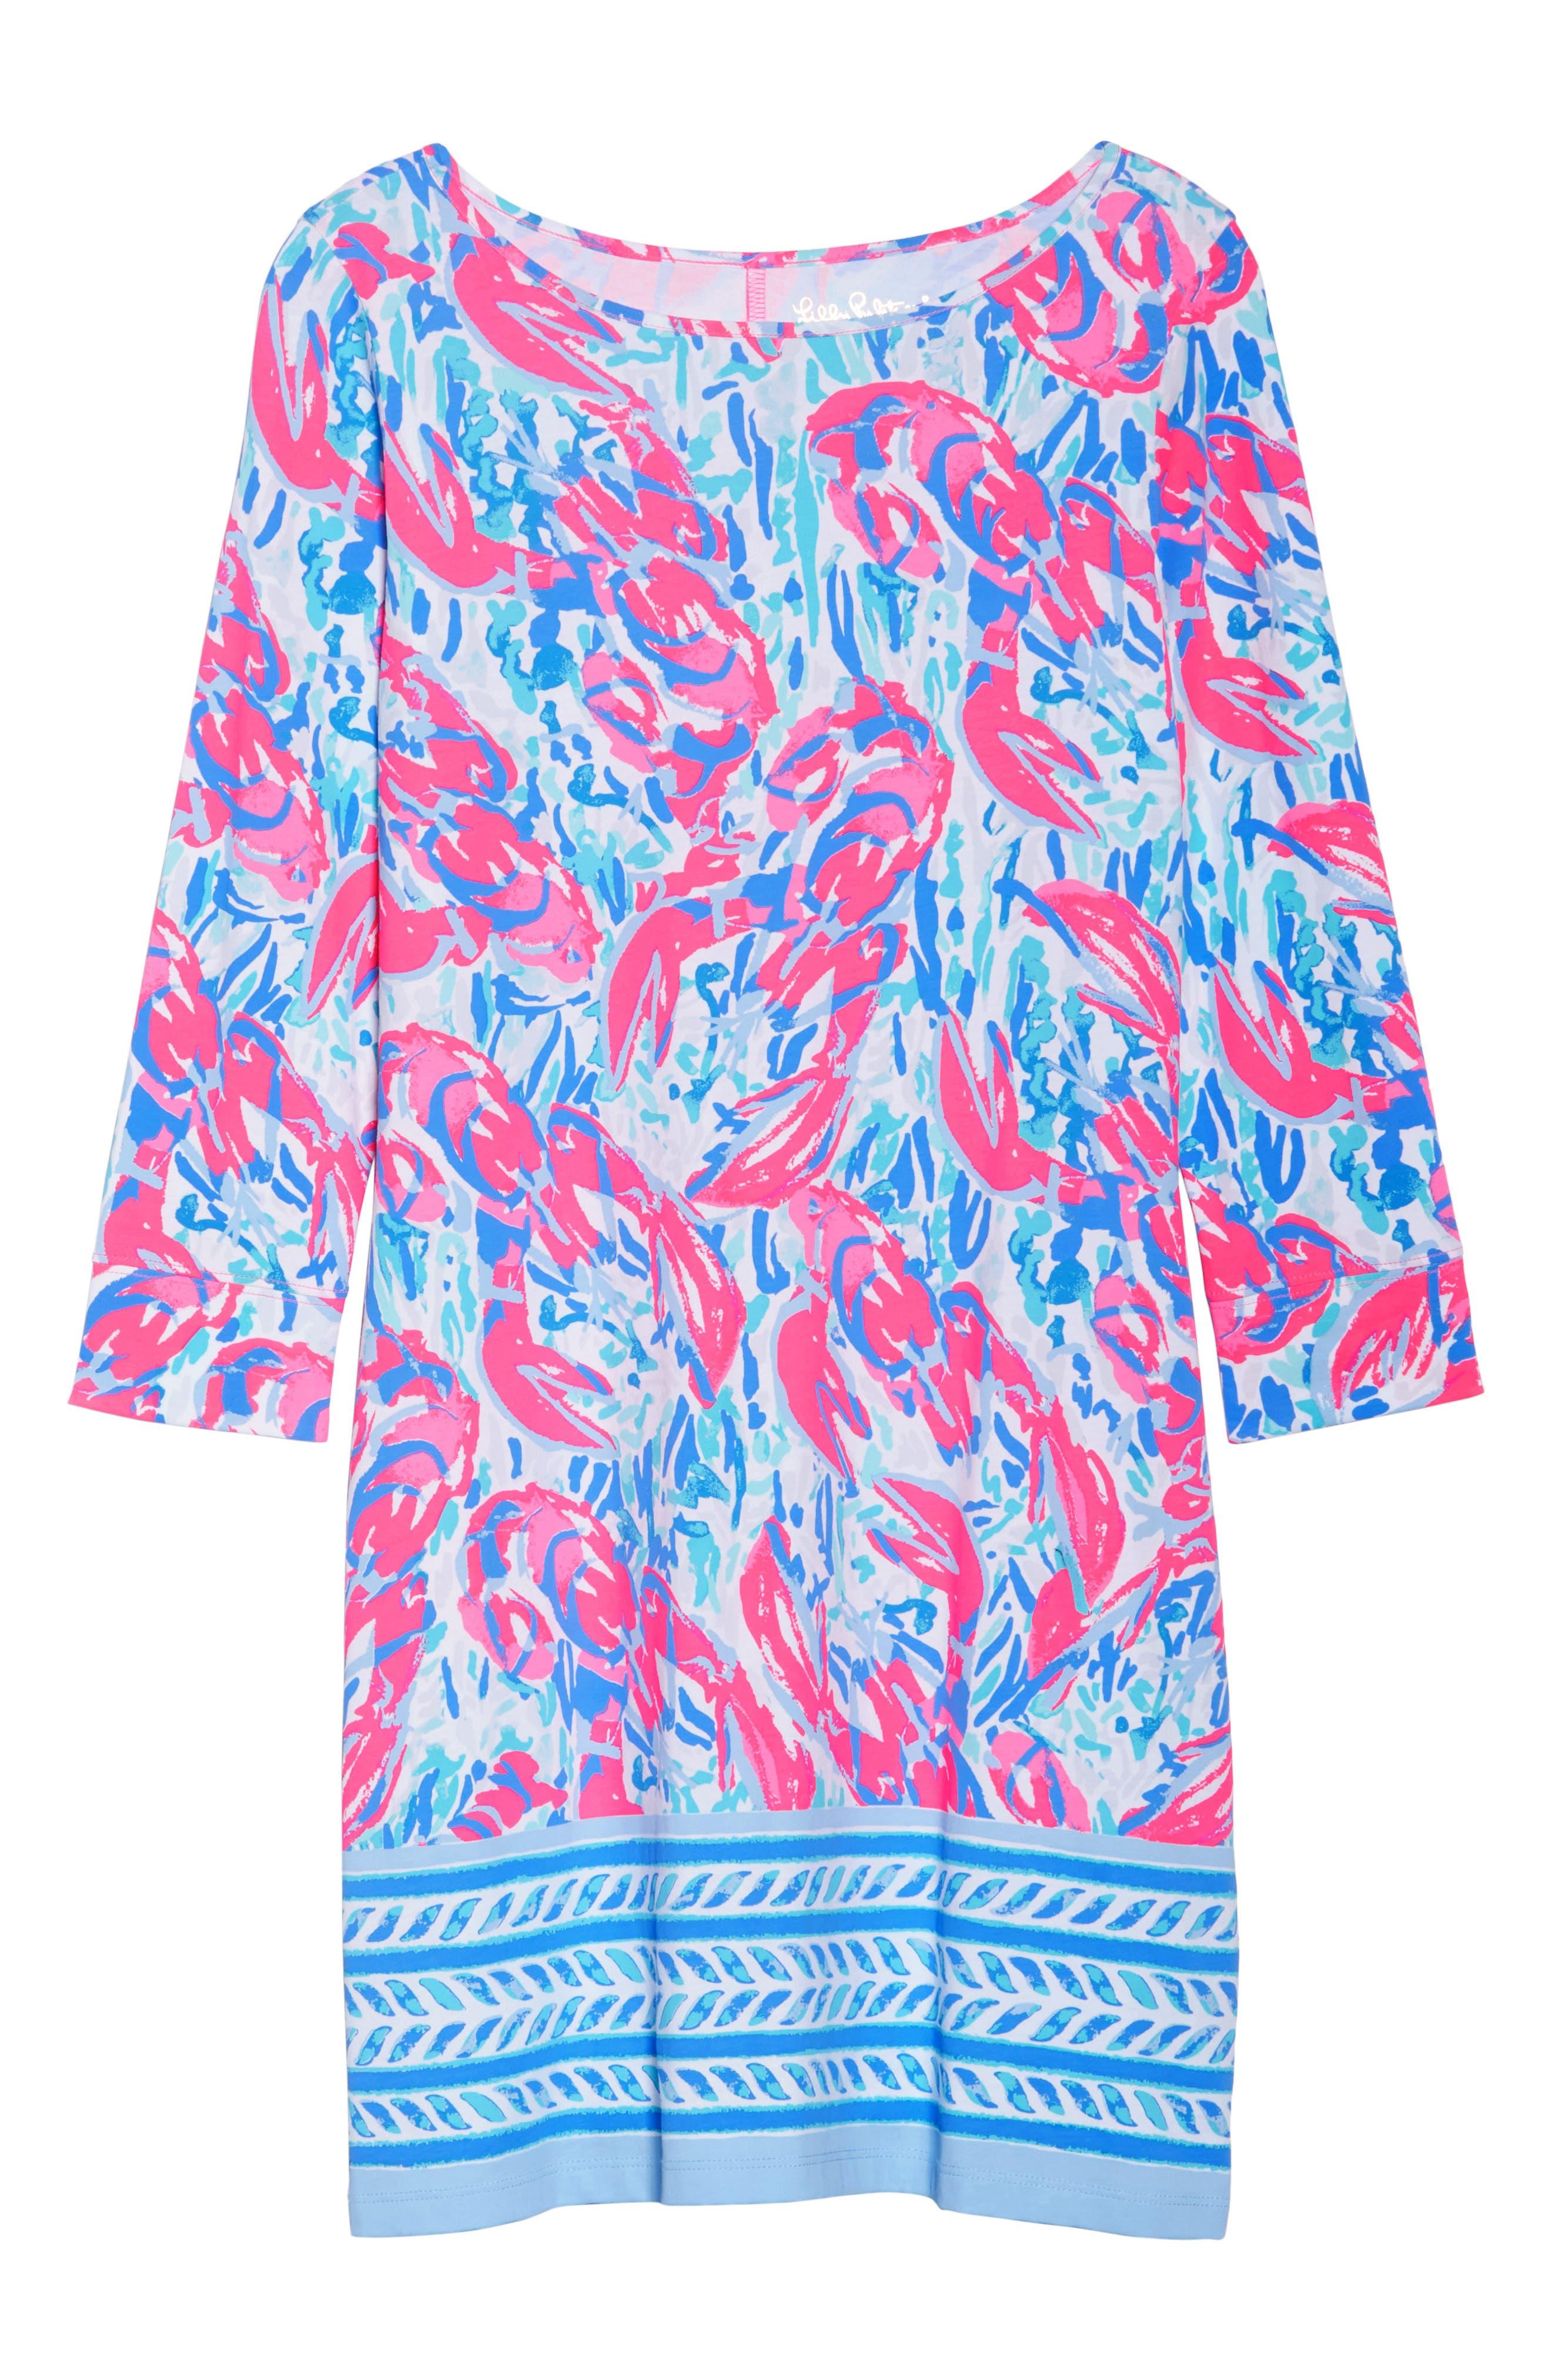 Marlowe Shift Dress,                             Alternate thumbnail 7, color,                             695